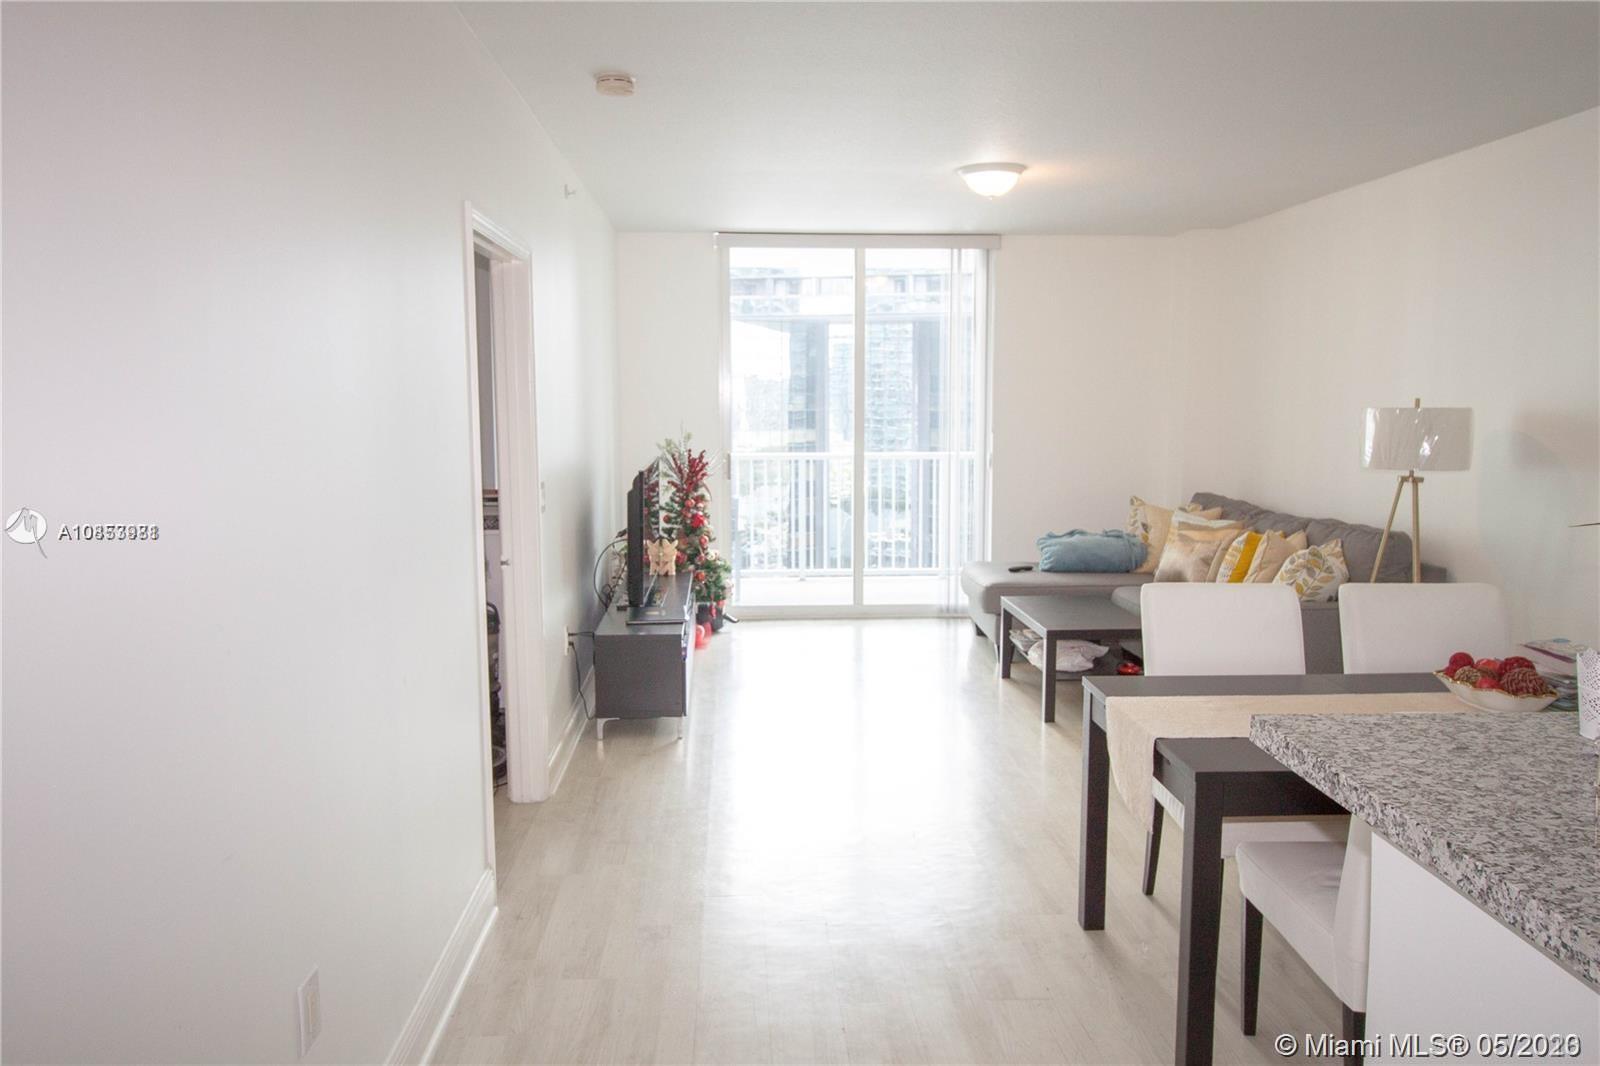 1250 S Miami Ave # 1710, Miami, Florida 33130, 1 Bedroom Bedrooms, ,2 BathroomsBathrooms,Residential,For Sale,1250 S Miami Ave # 1710,A10853981